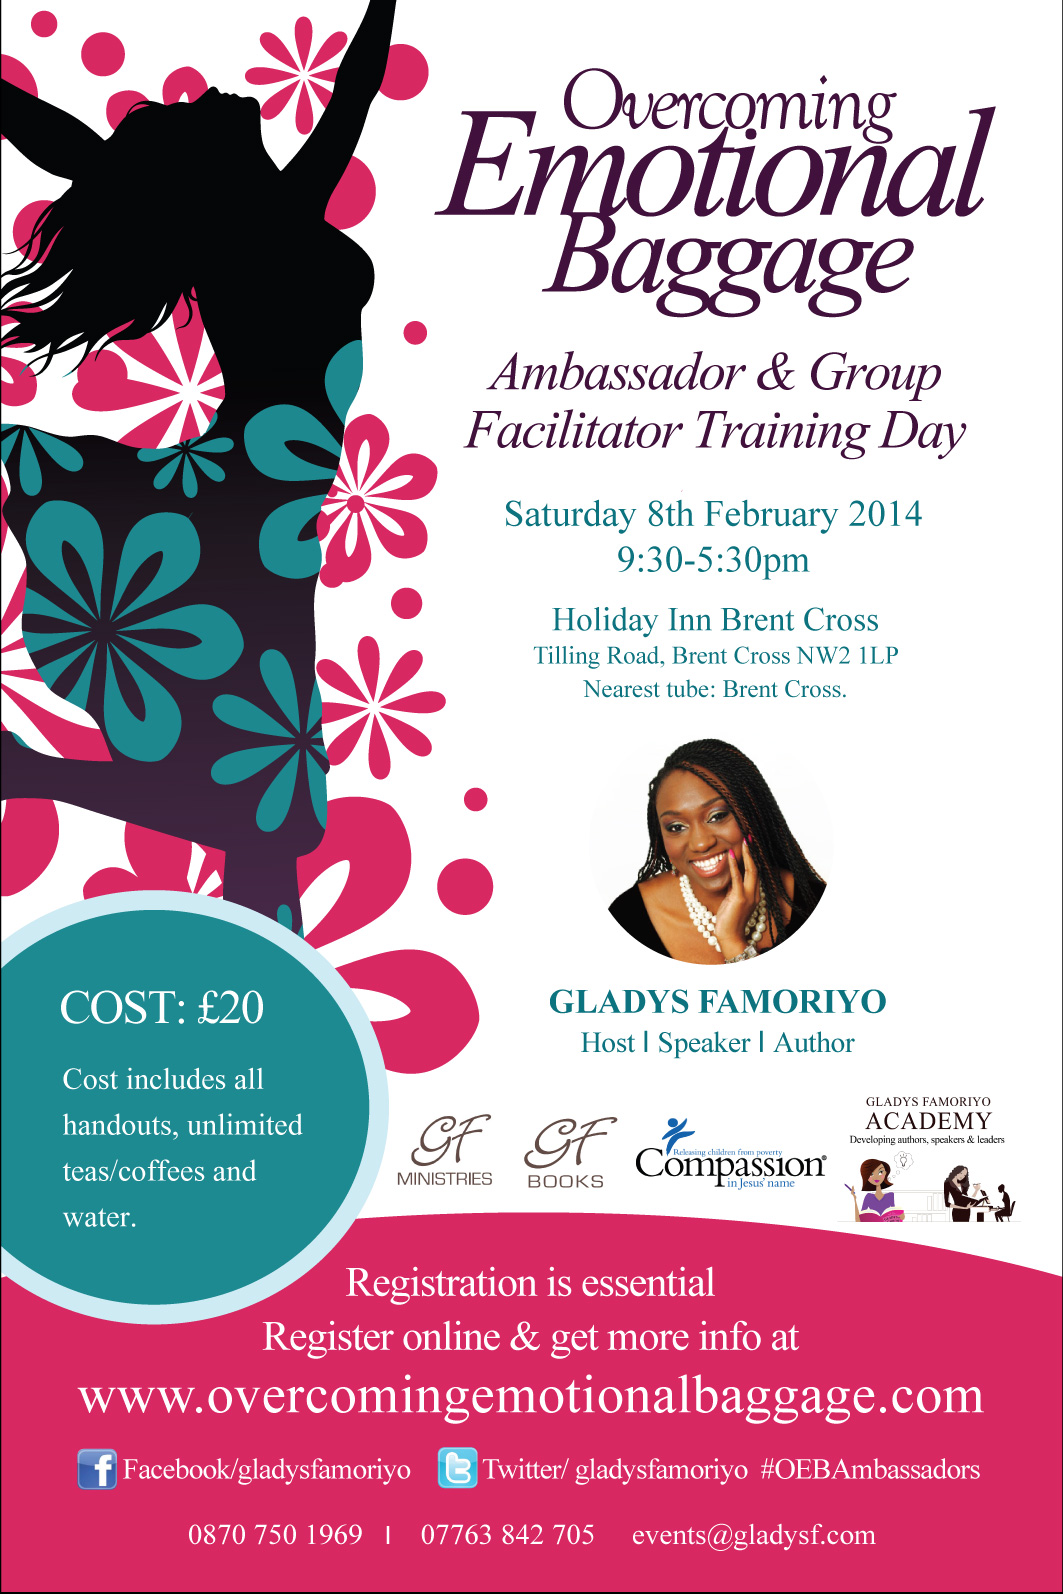 Overcoming Emotional Baggage Ambassador Training - Gladys Famoriyo